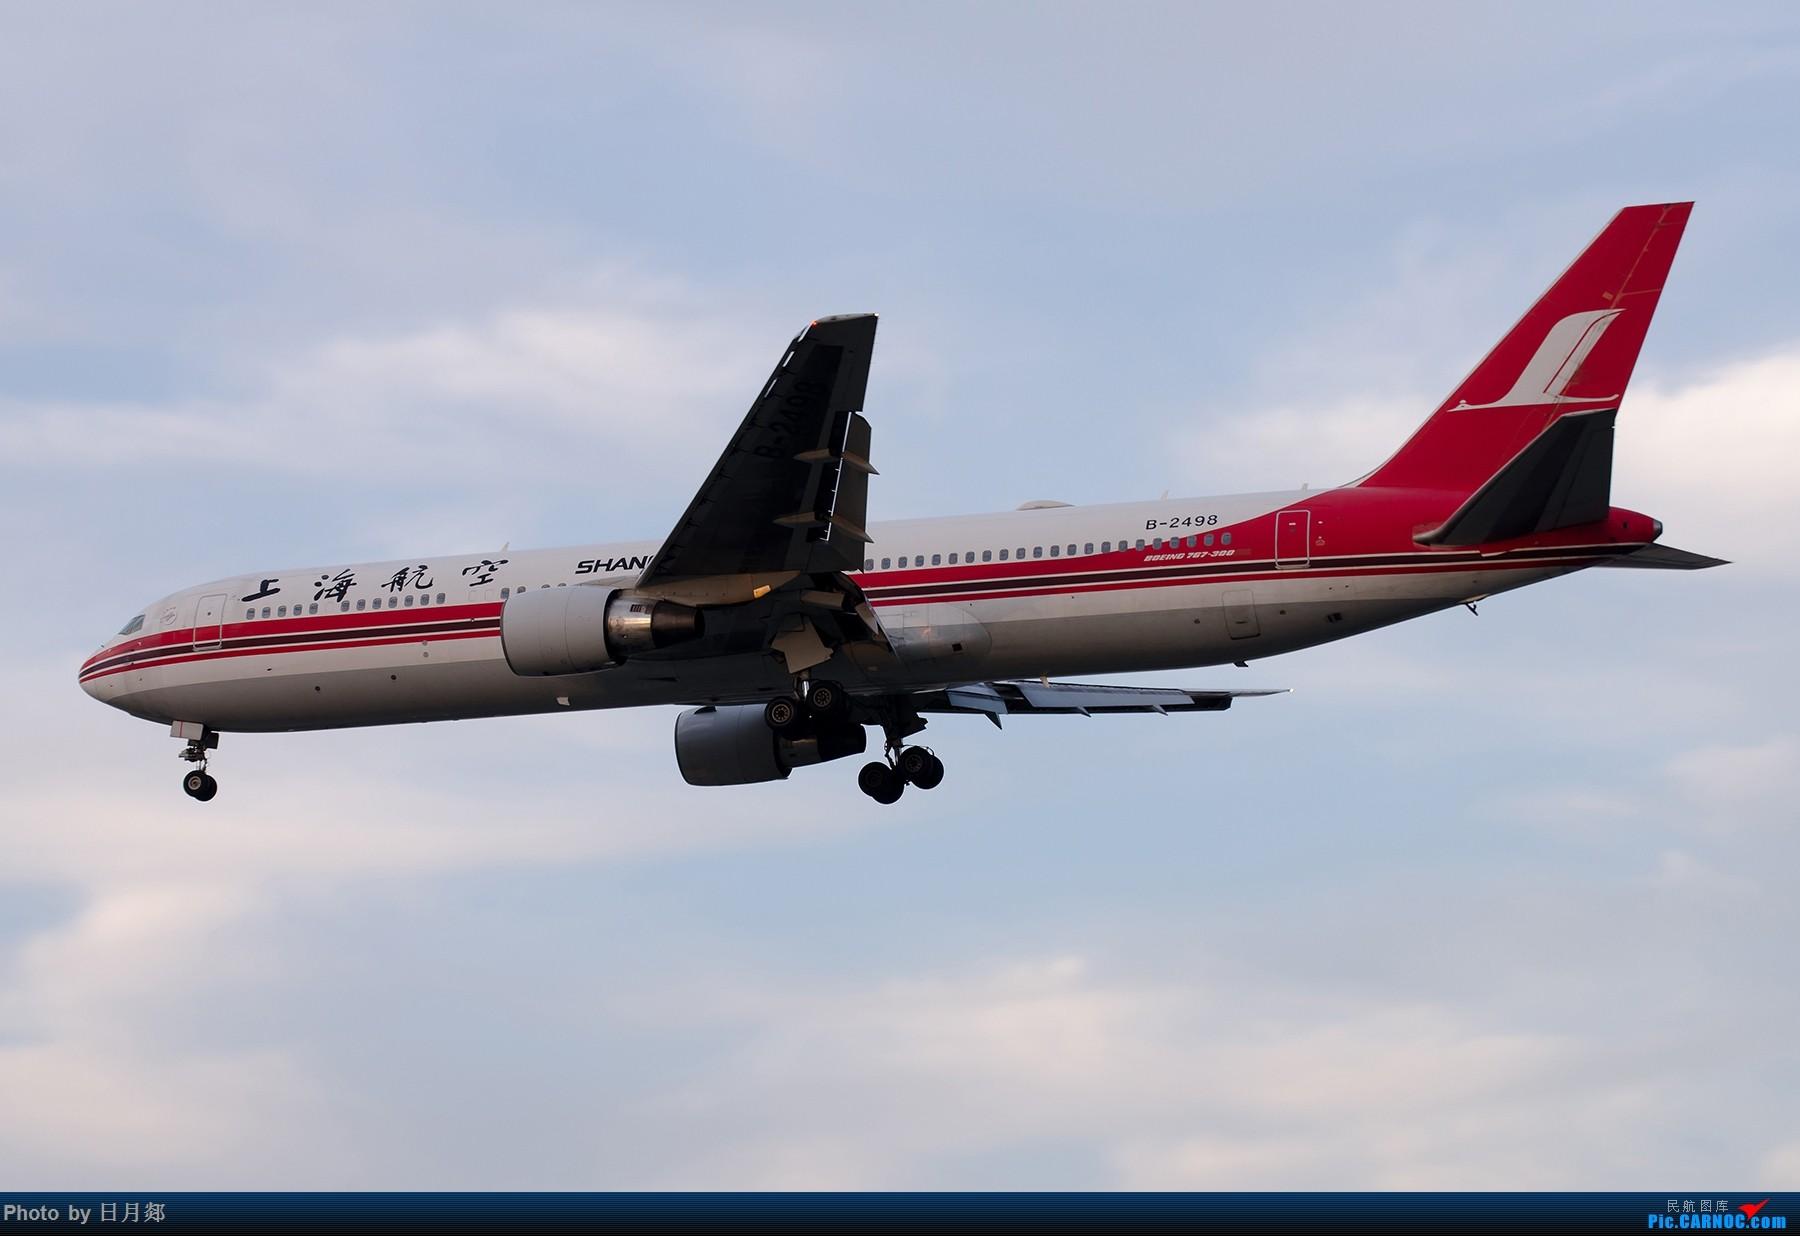 Re:[原创]【SHA拍机*1800大图】轻度污染来临前宝贵的蓝天,且拍且珍惜 BOEING 767-300 B-2498 中国上海虹桥国际机场